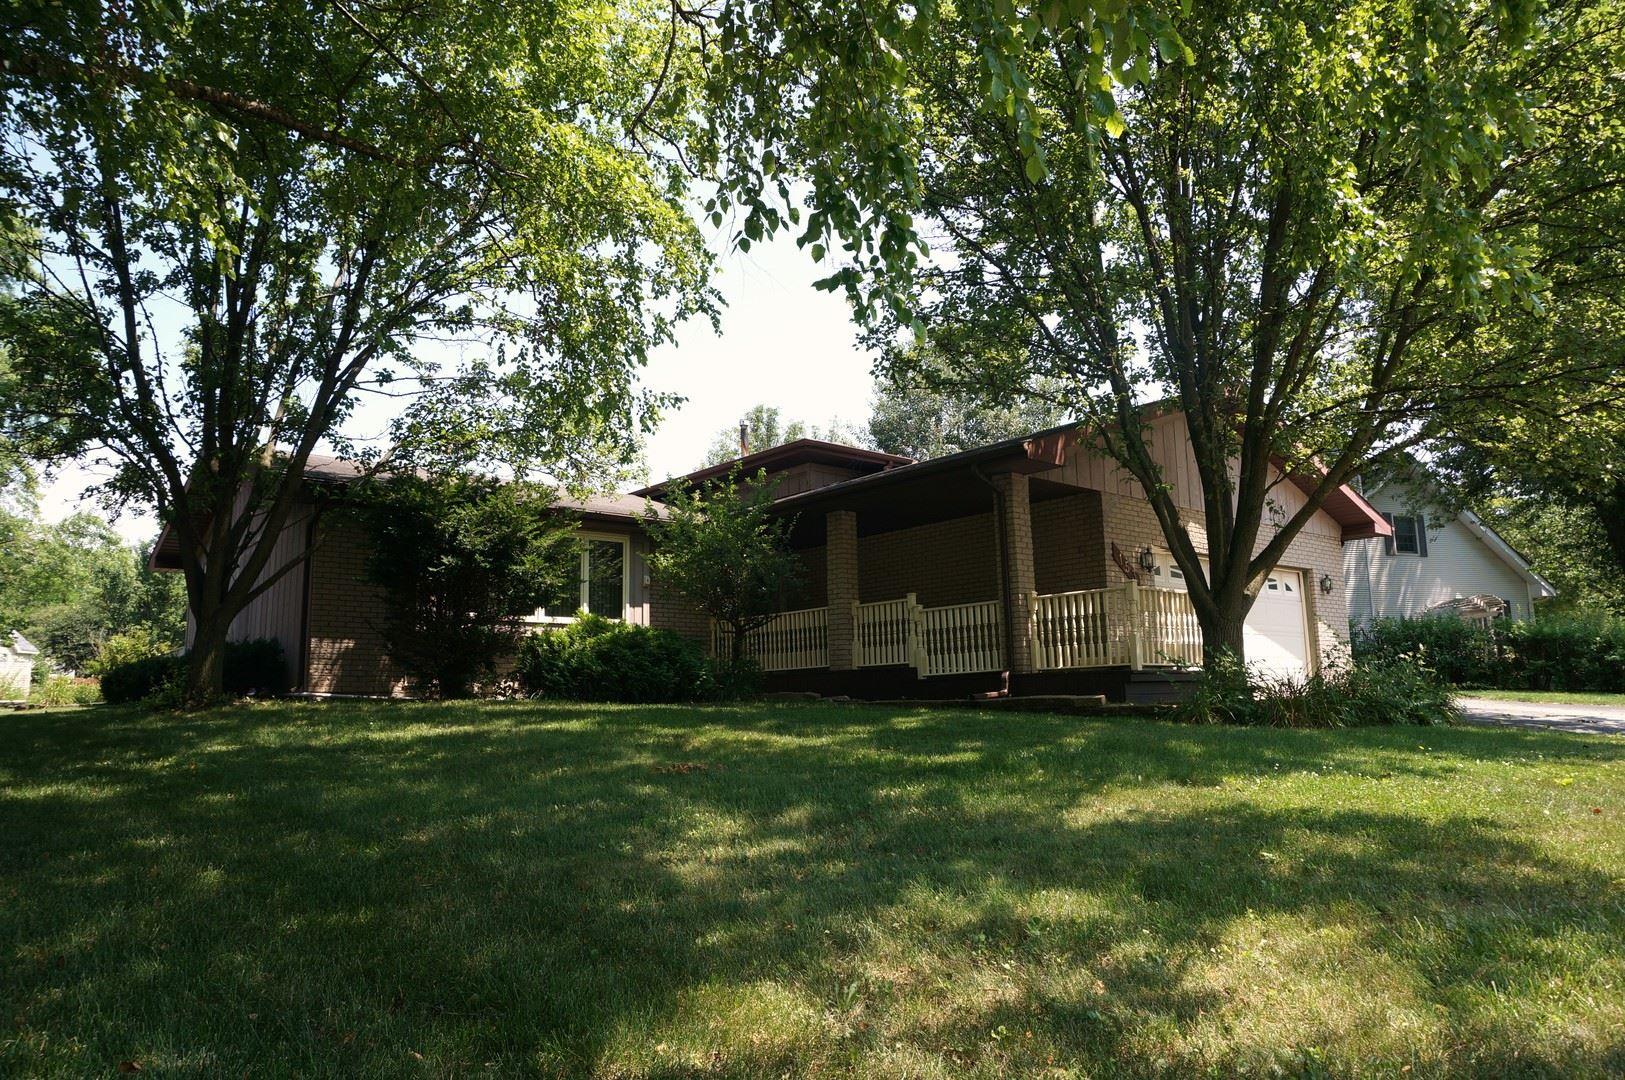 153 Aspen Drive, New Lenox, IL 60451 - #: 10759383